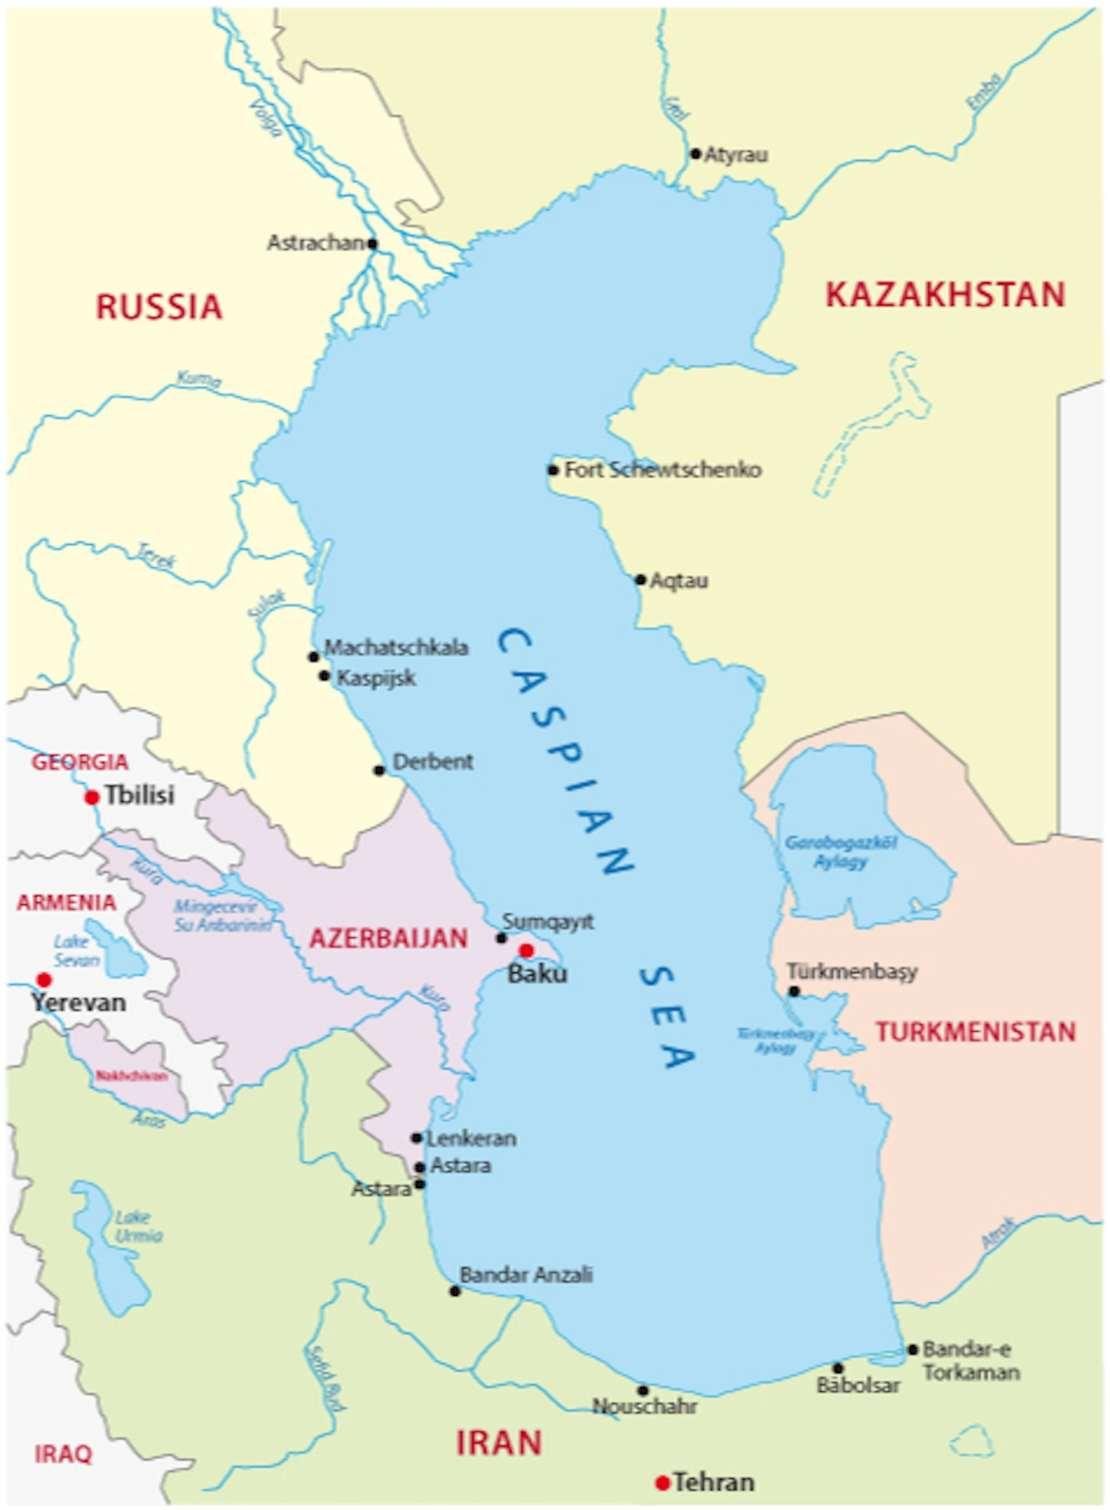 Map of the Caspian Sea.